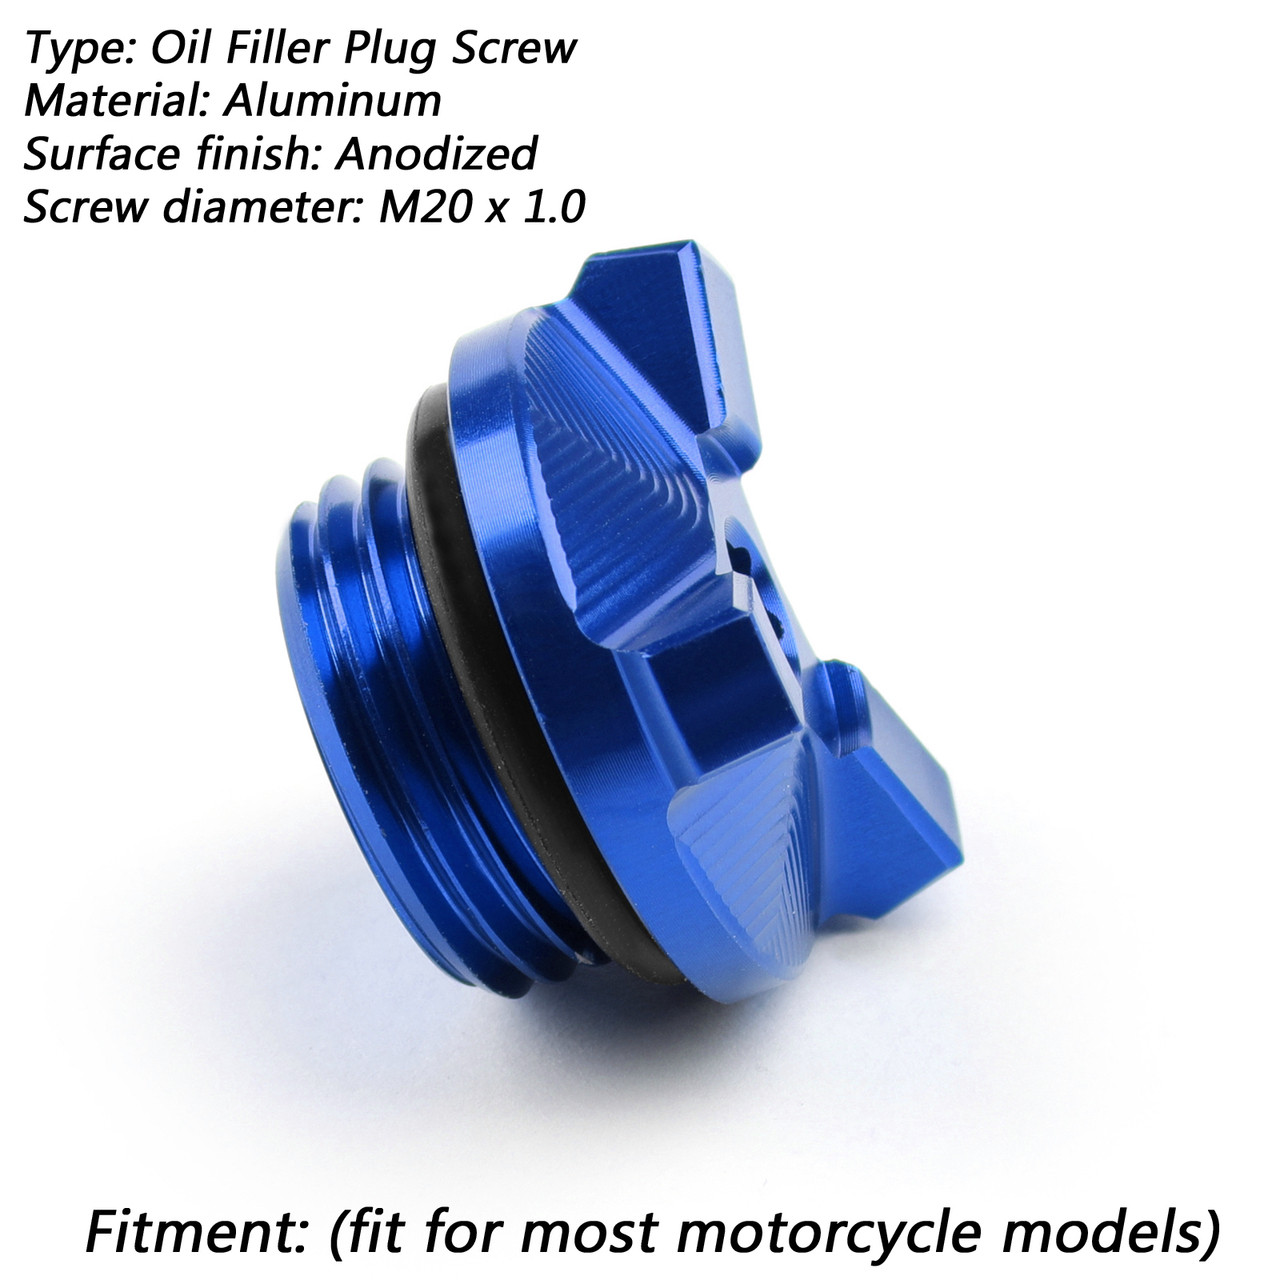 M20 Engine Oil Filler Plug Fill Cap Screw For Yamaha YZ80/85 YZ125 YZ250  YZ250F WR250F YZ450F YZ125X T-MAX XSR900 Blue